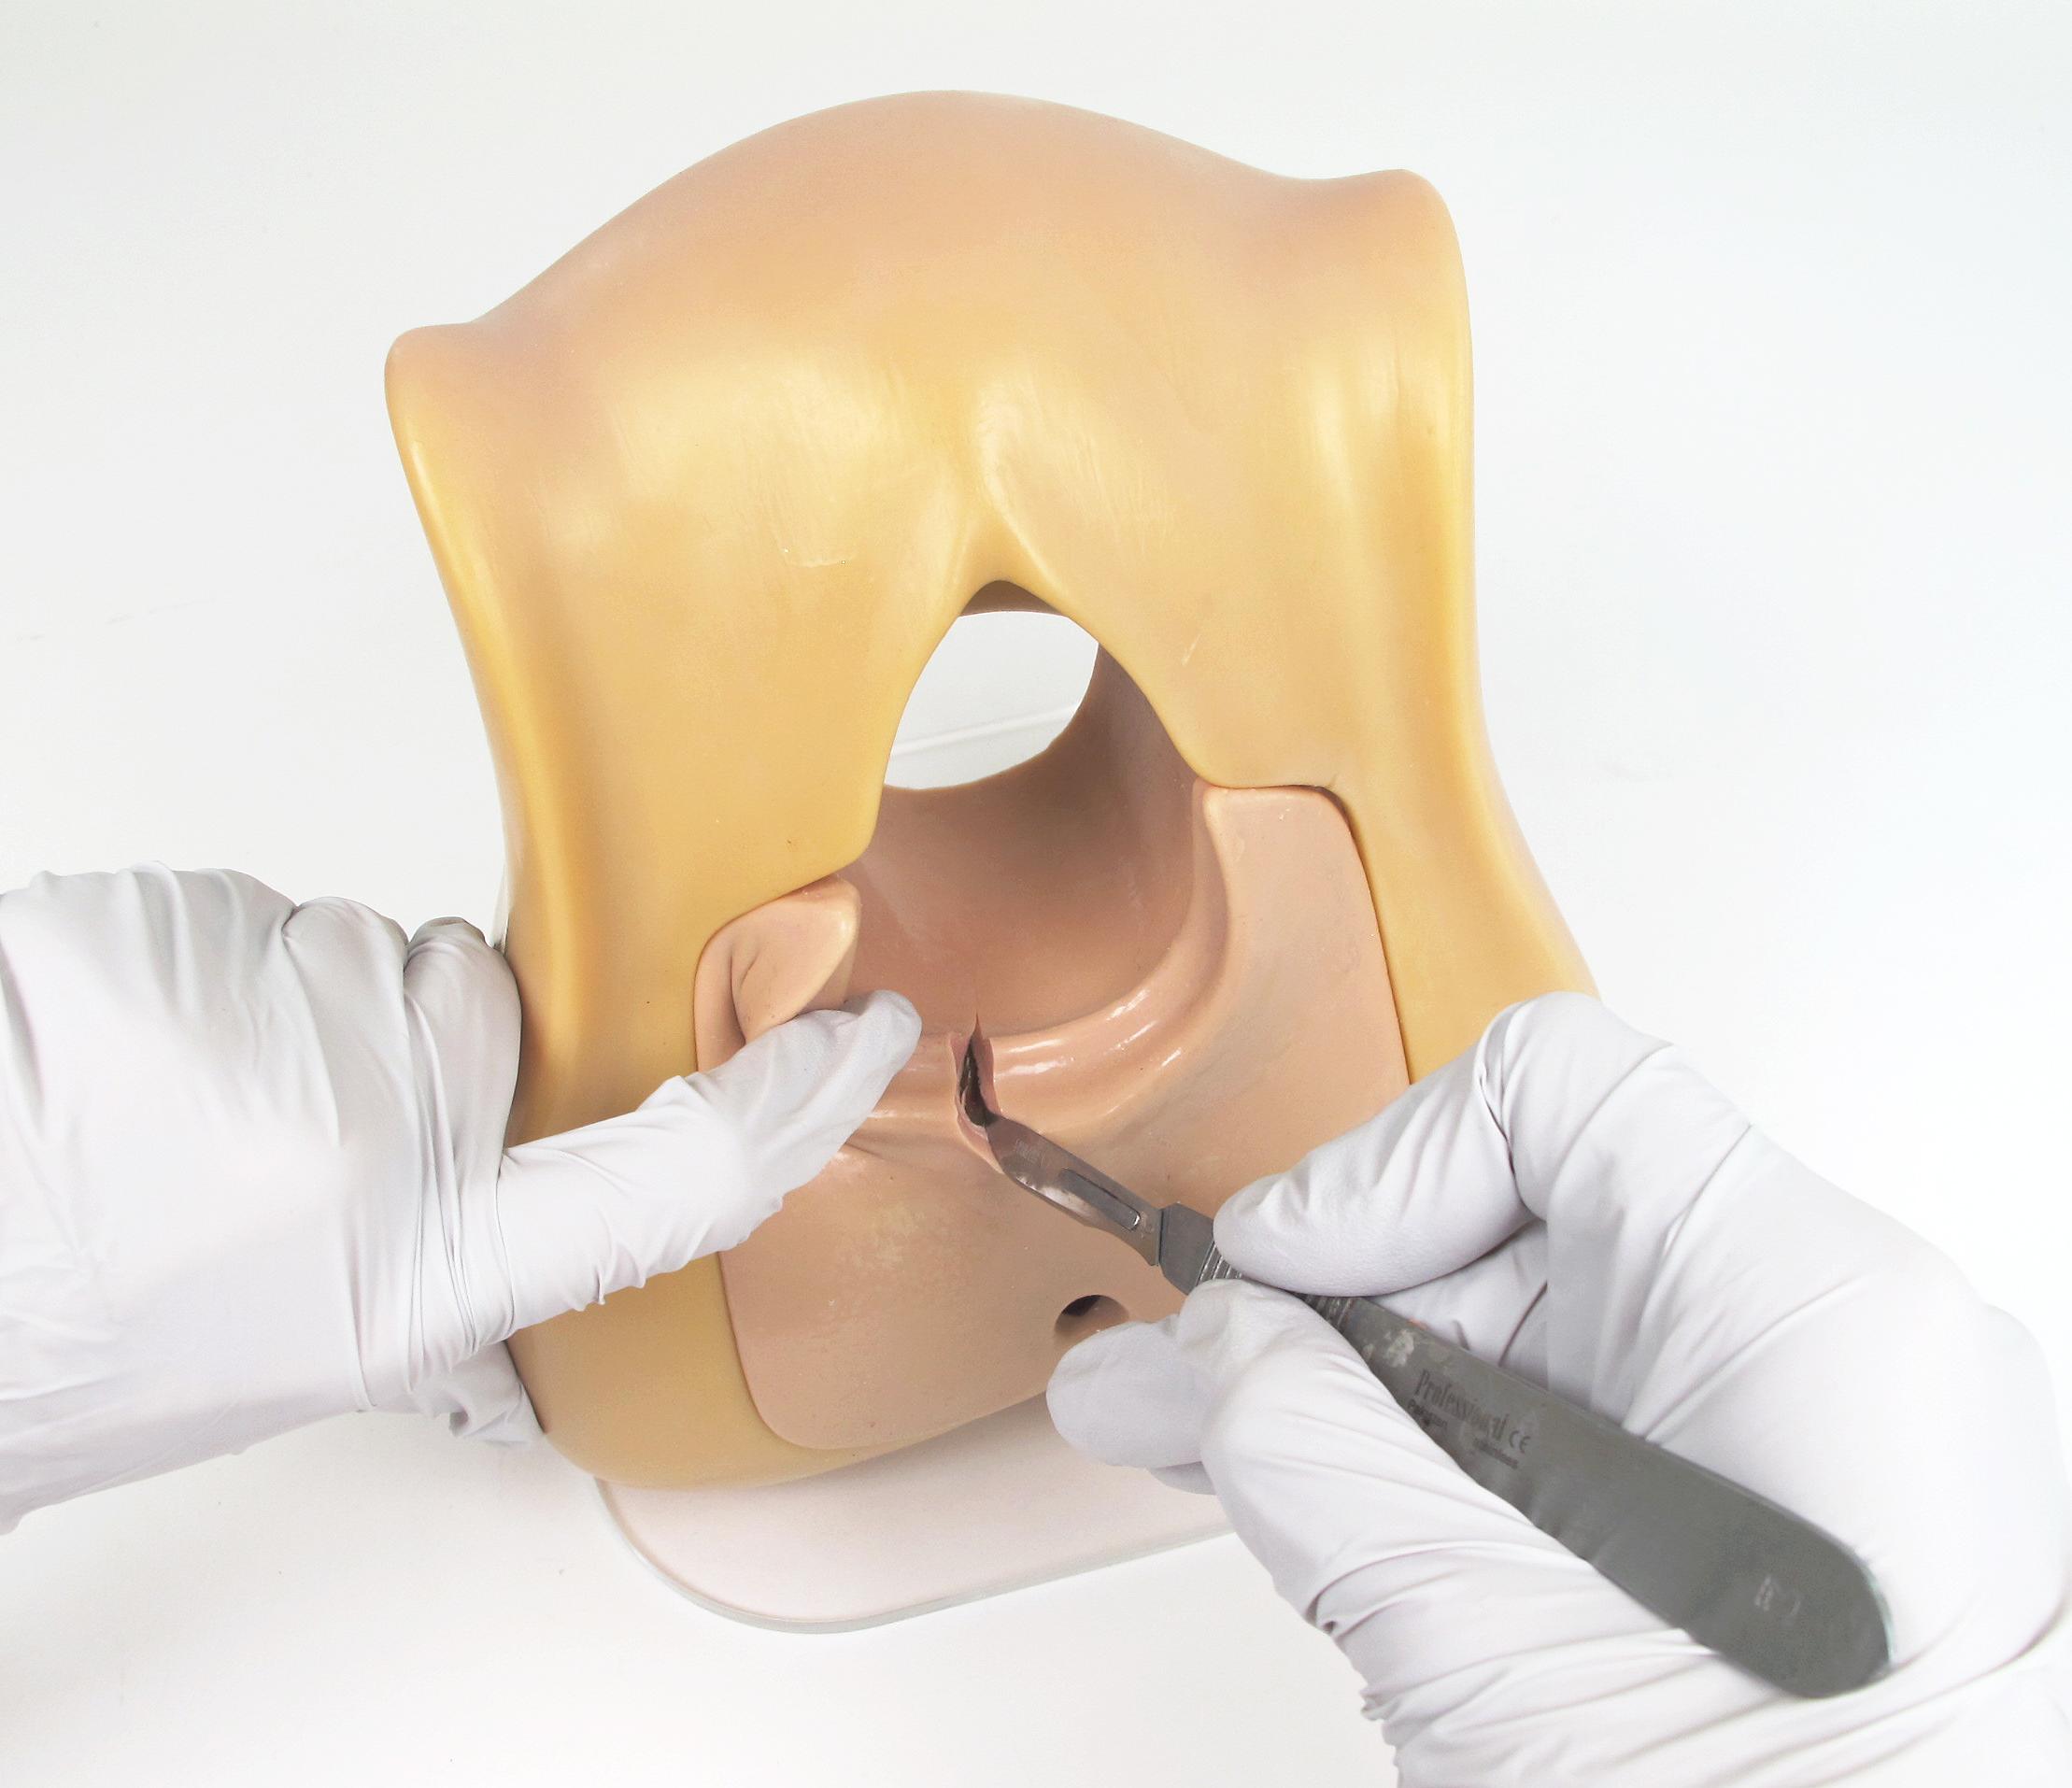 Episiotomy Trainer05